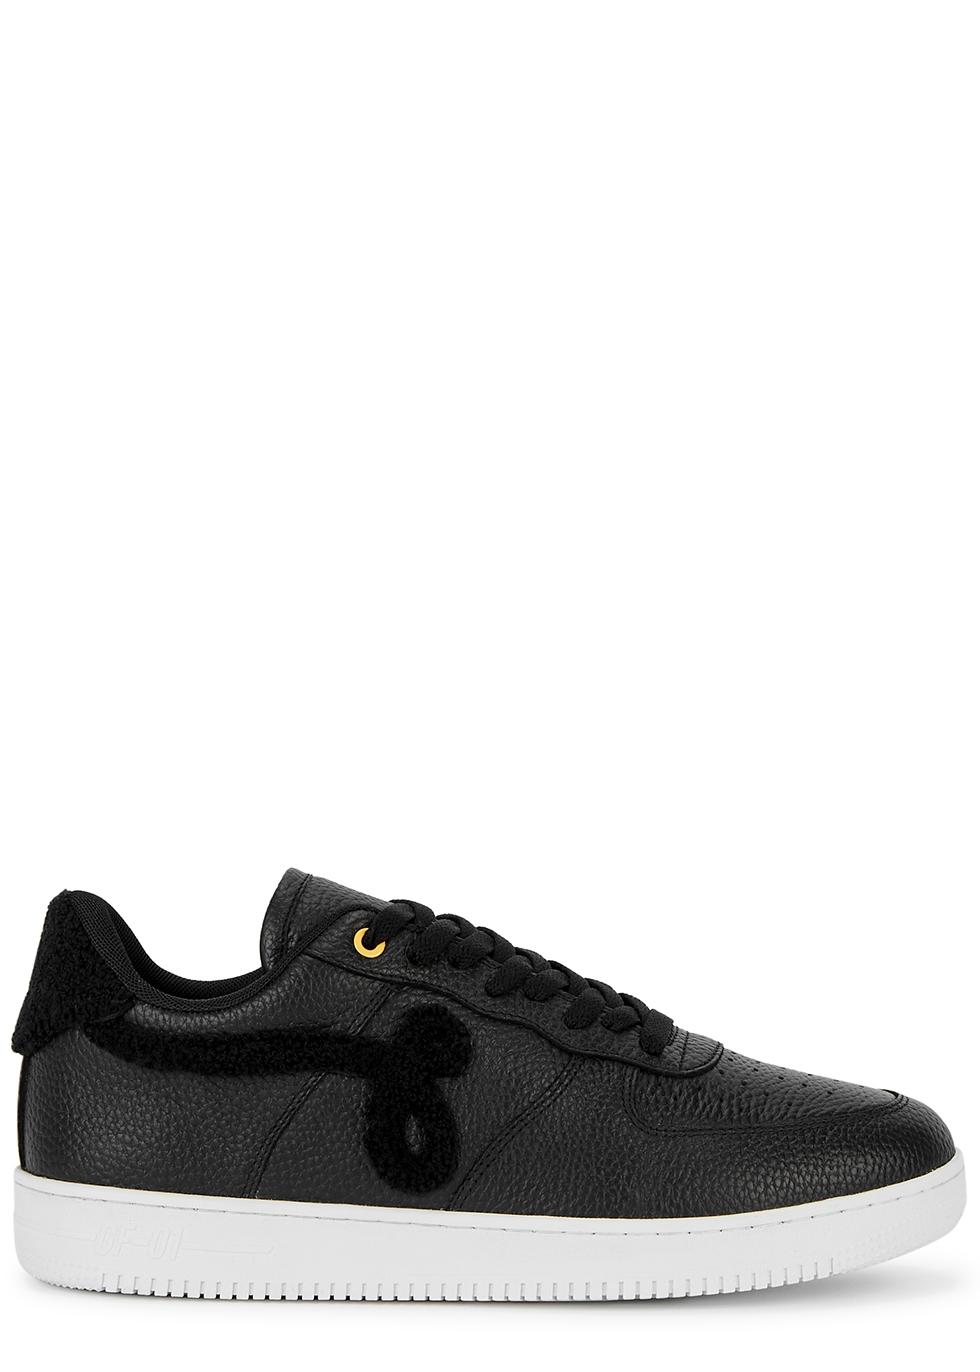 GF-01 black leather sneakers